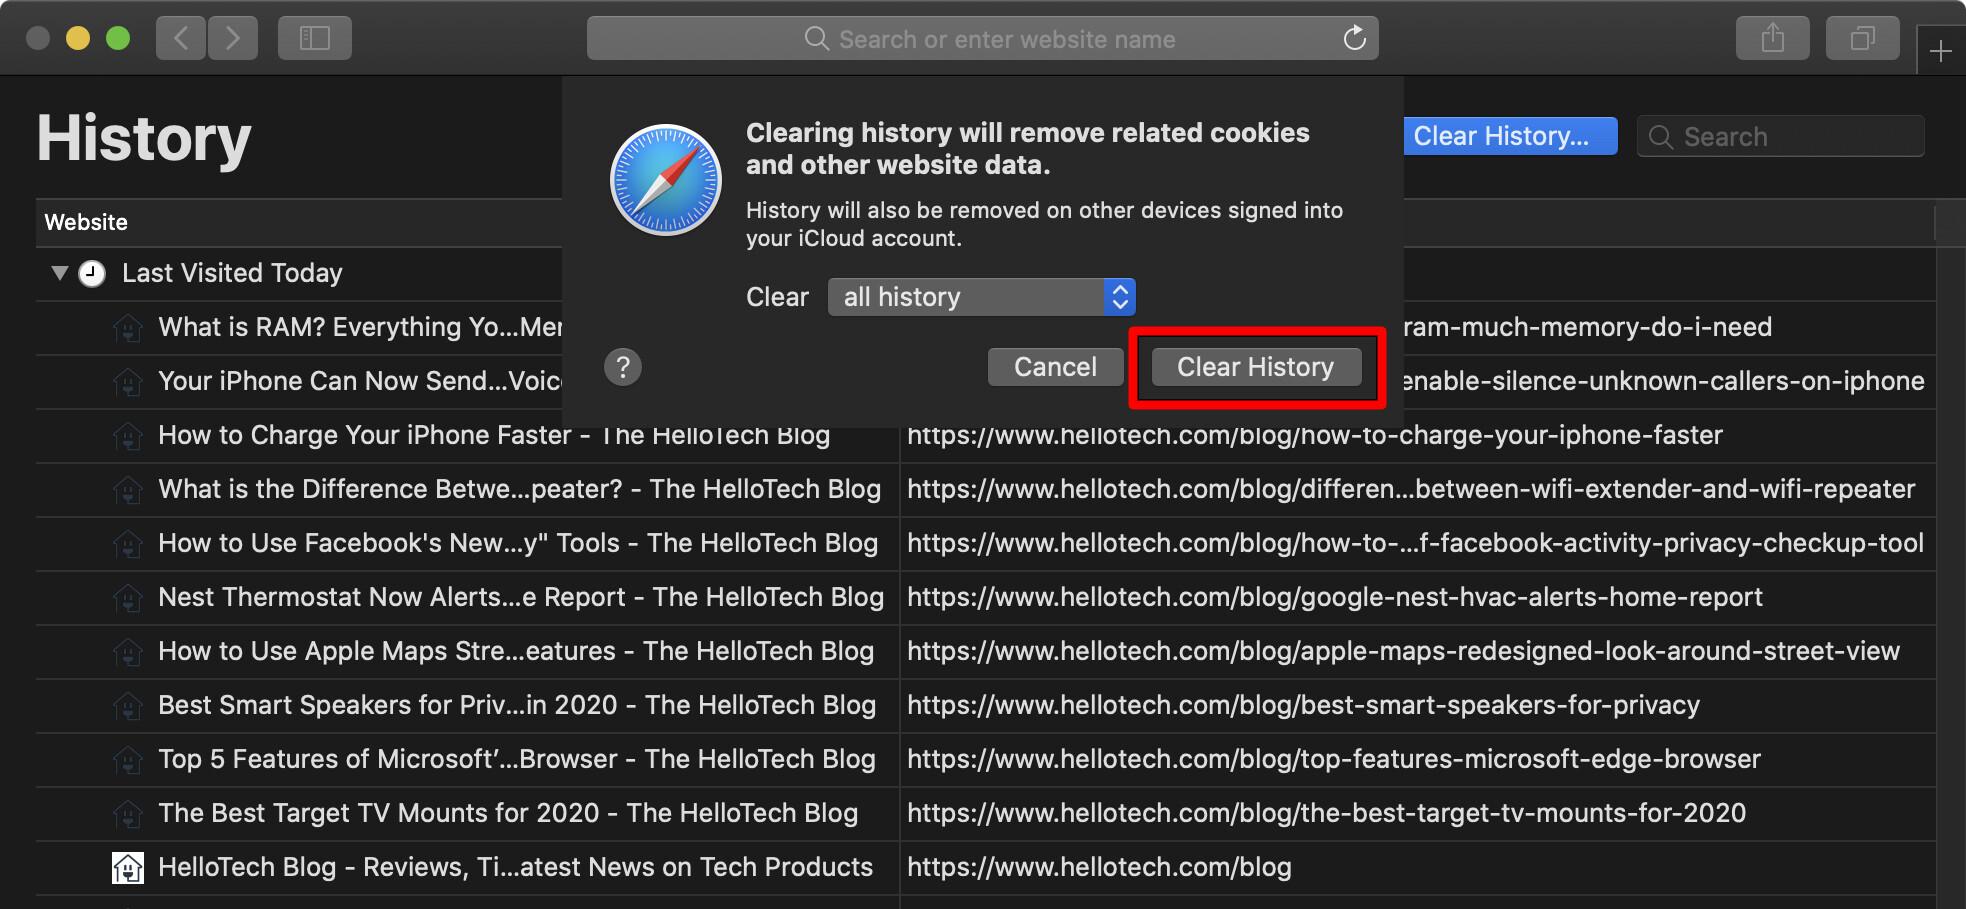 8. Cara Menghapus Riwayat Pencarian di Chrome Safari Firefox dan Edge